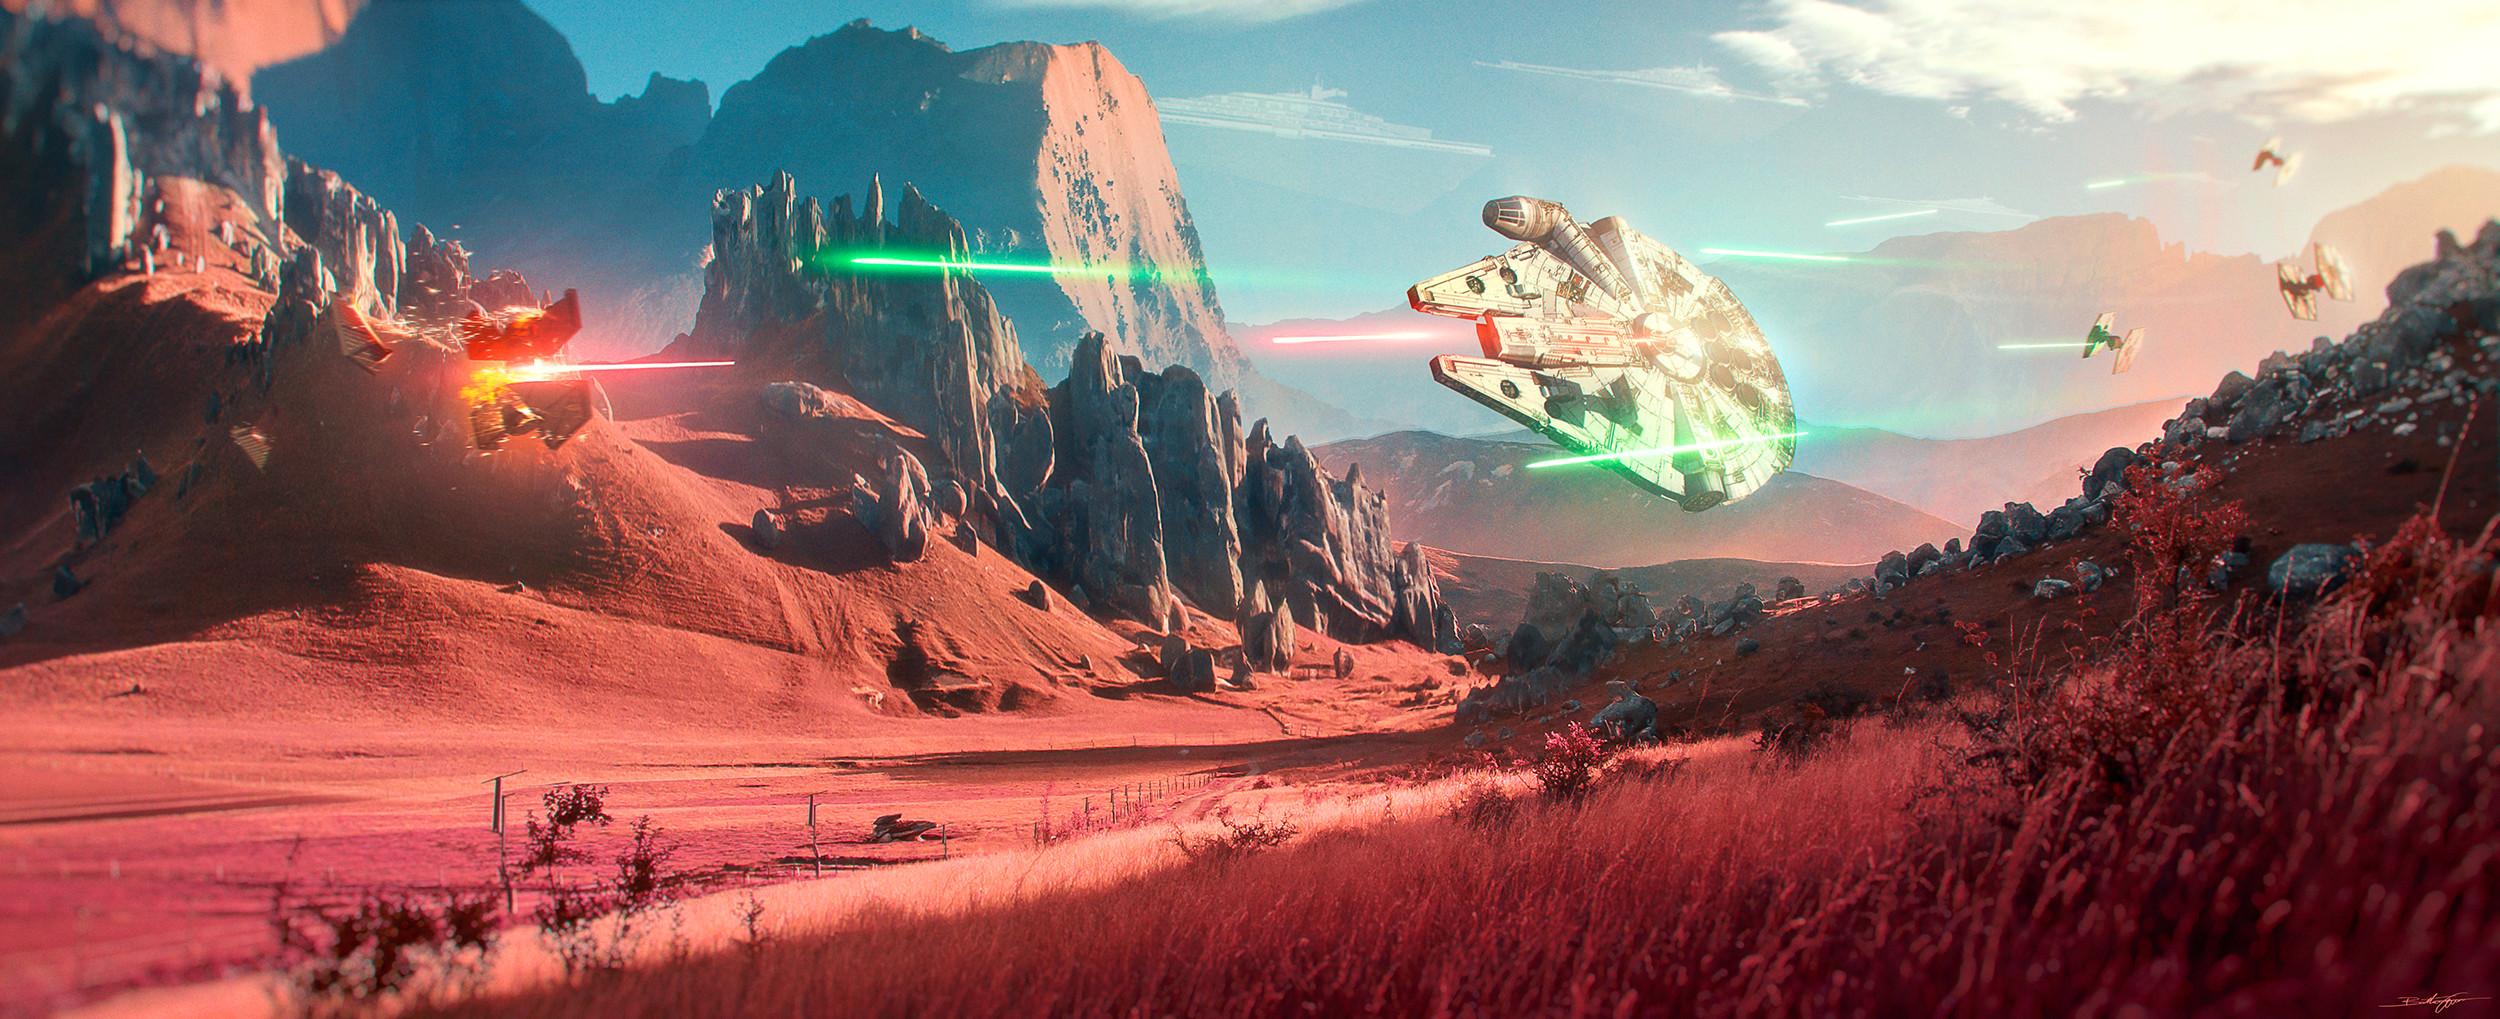 Millenium Falcon Star Wars Artwork Landscape Fictional Ultrawide 2500x1019